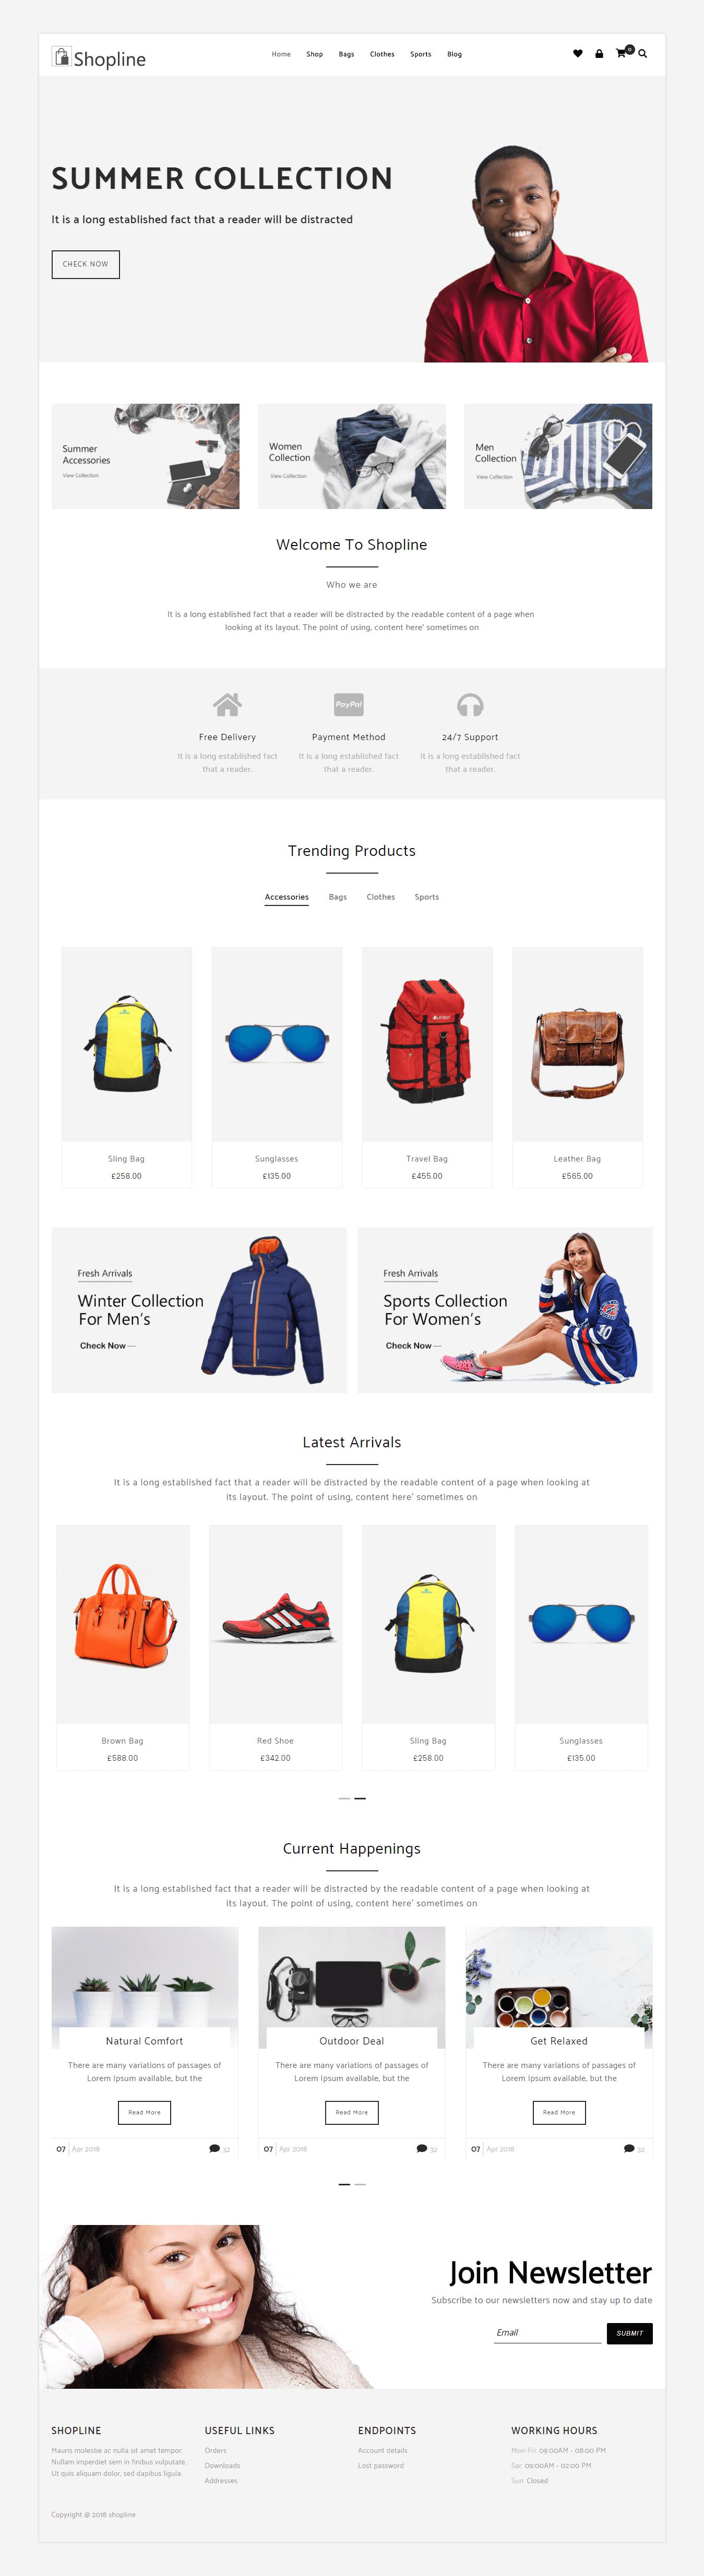 Shopline Pro Boxed Layout